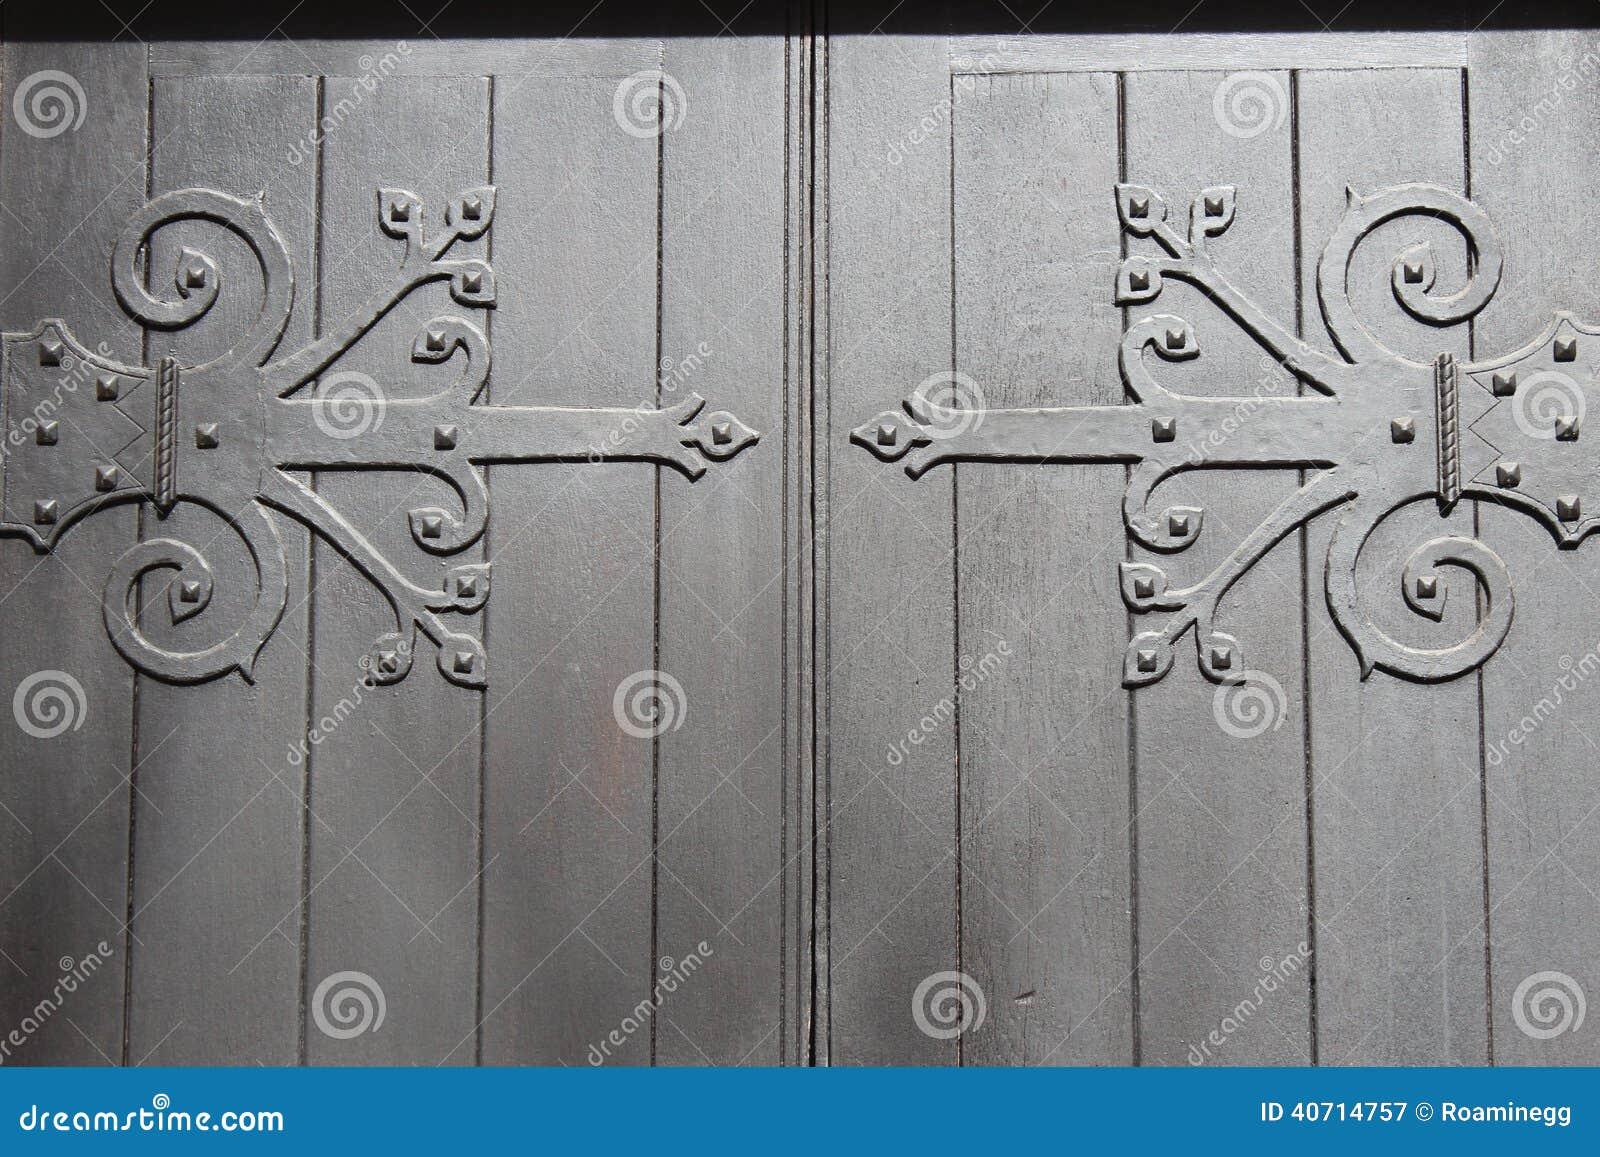 Download Decorative Door Hinges Stock Image. Image Of Design, Detail    40714757